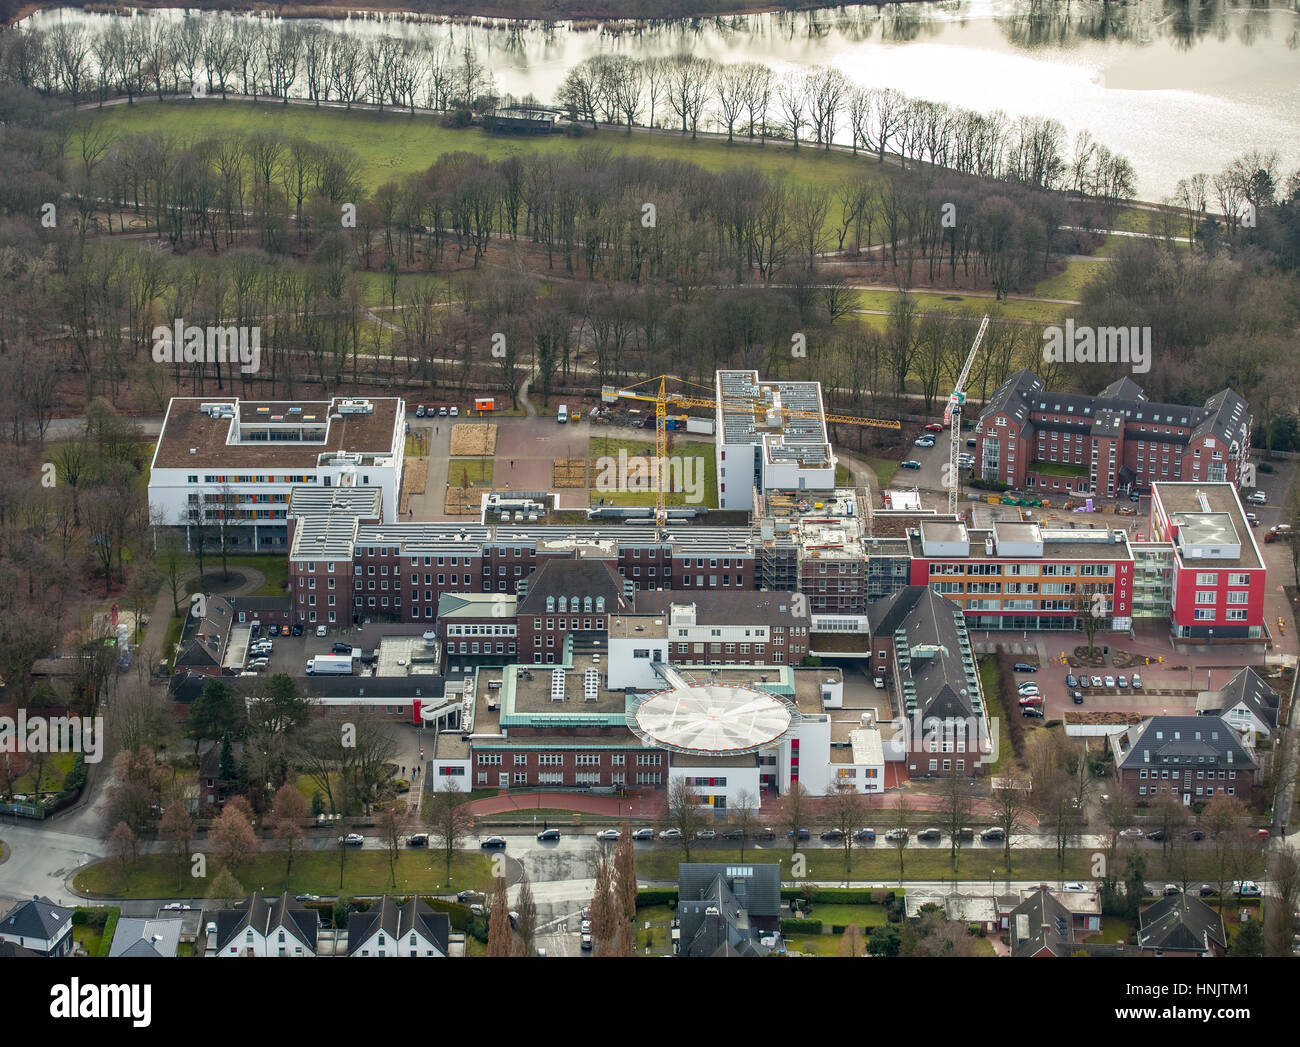 Bergmannsheil Clinic Gelsenkirchen-Buer, Gelsenkirchen-Buer, Ruhr Area, North Rhine-Westphalia, Germany - Stock Image